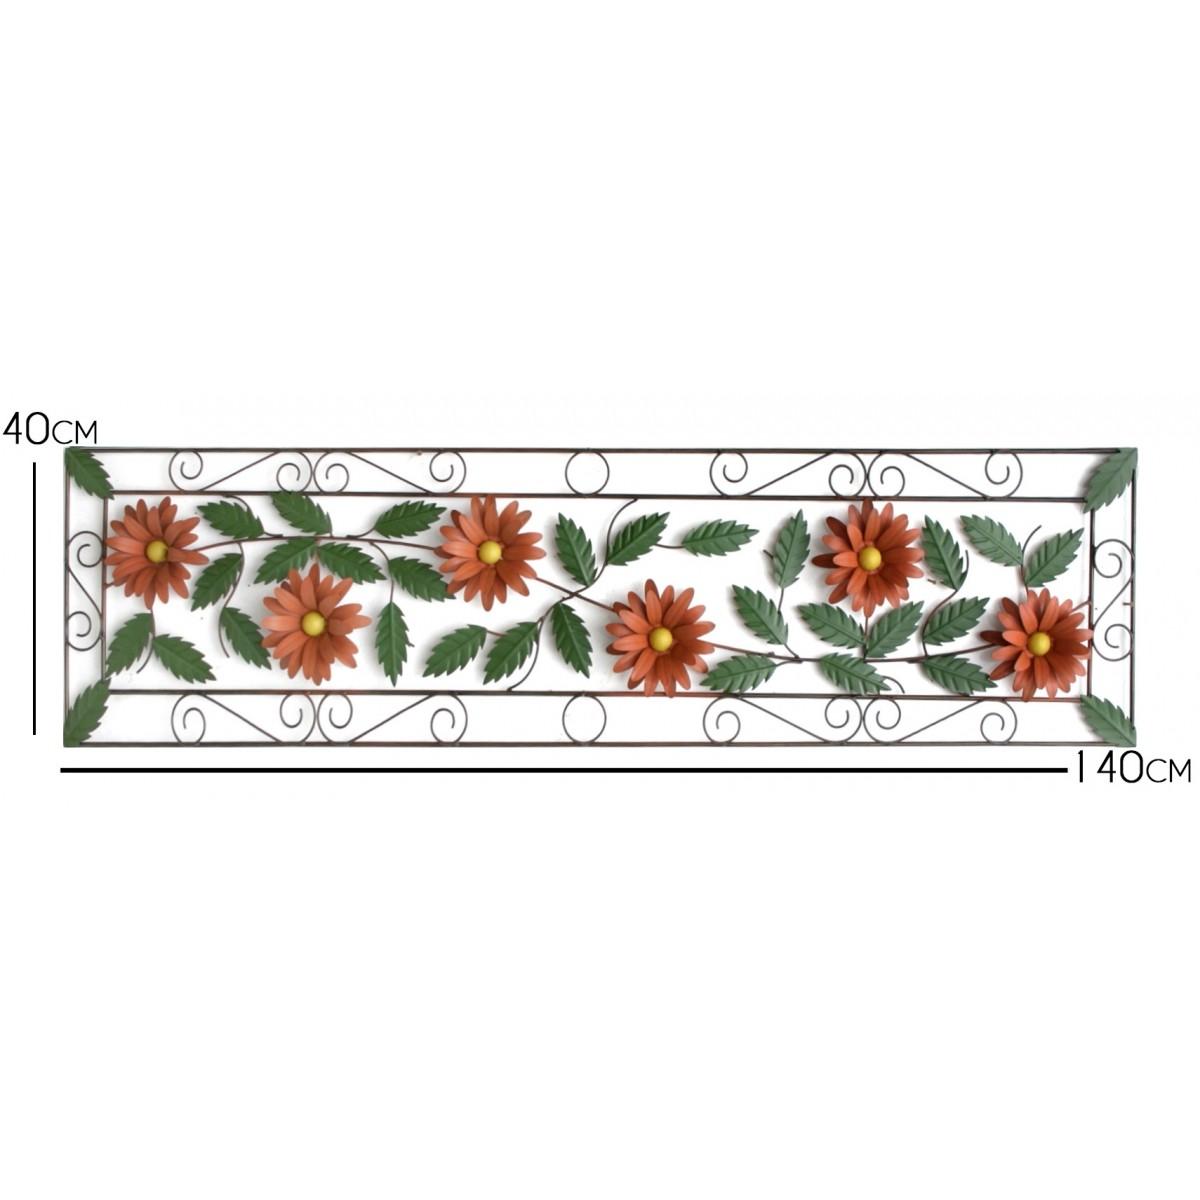 Moldura de Parede Rustica para Varanda Decorativo de Ferro